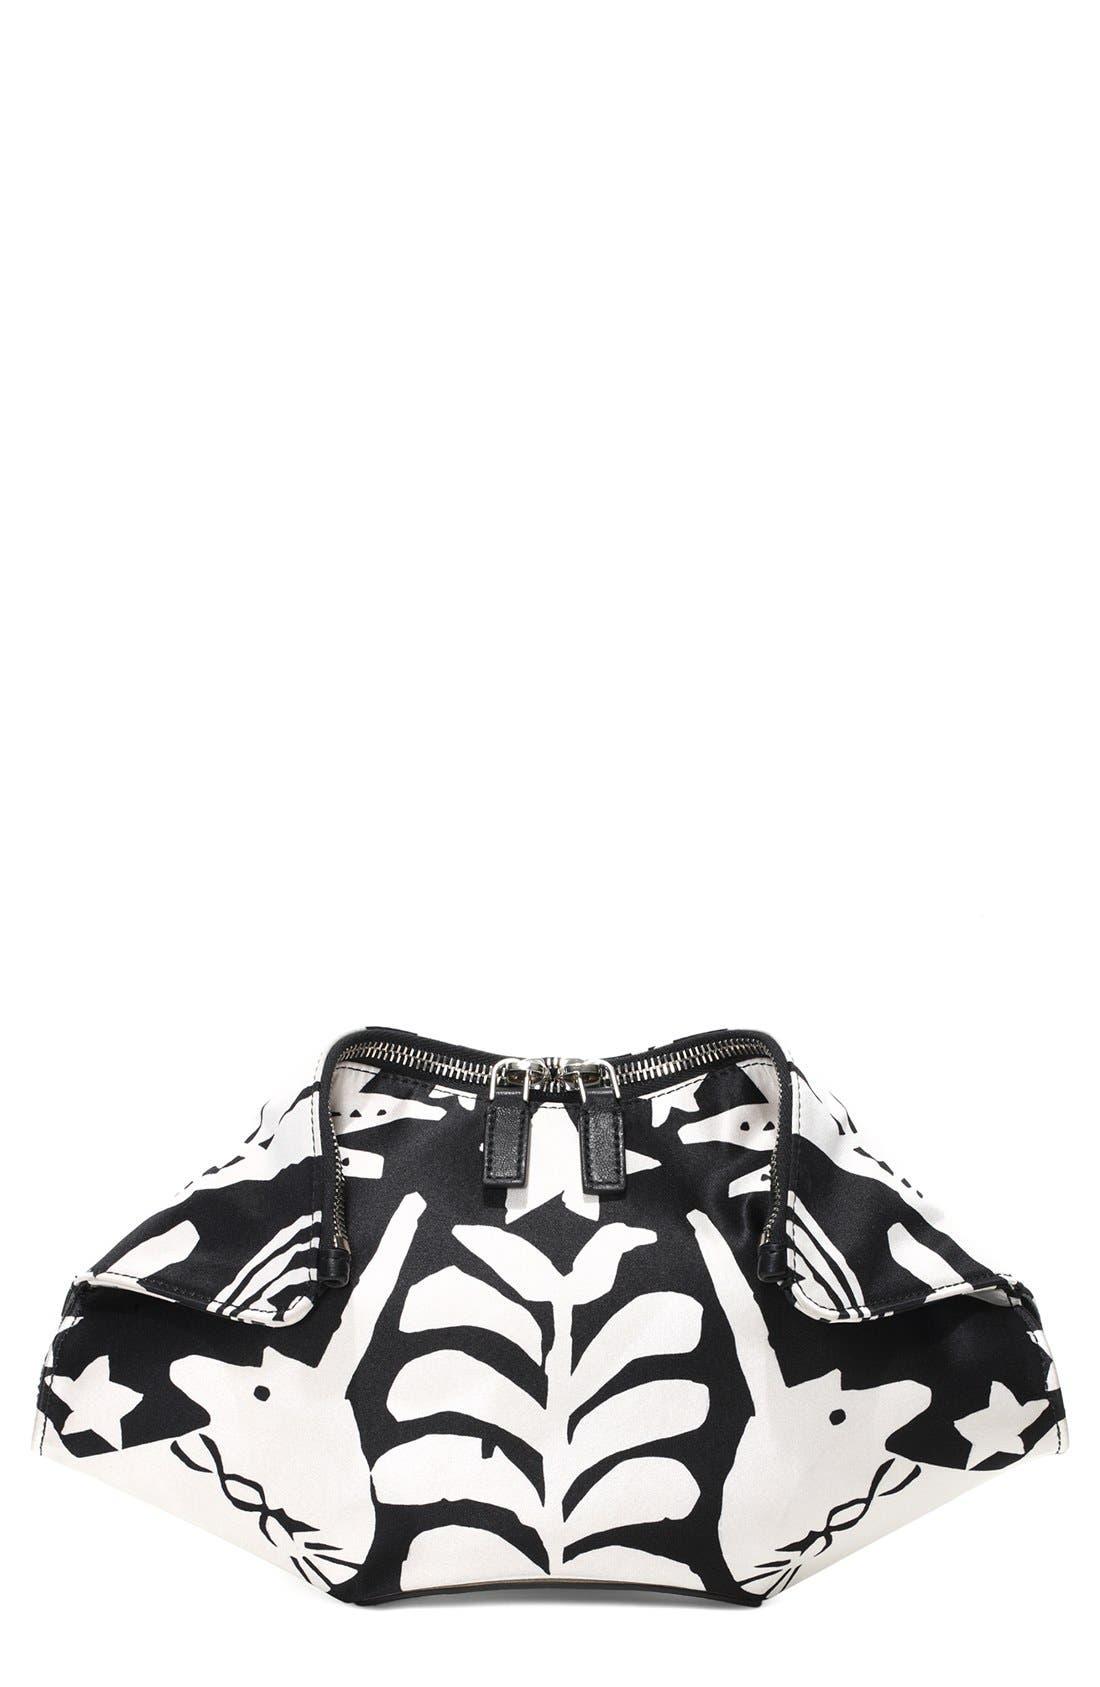 Main Image - Alexander McQueen 'De Manta' Print Silk Clutch